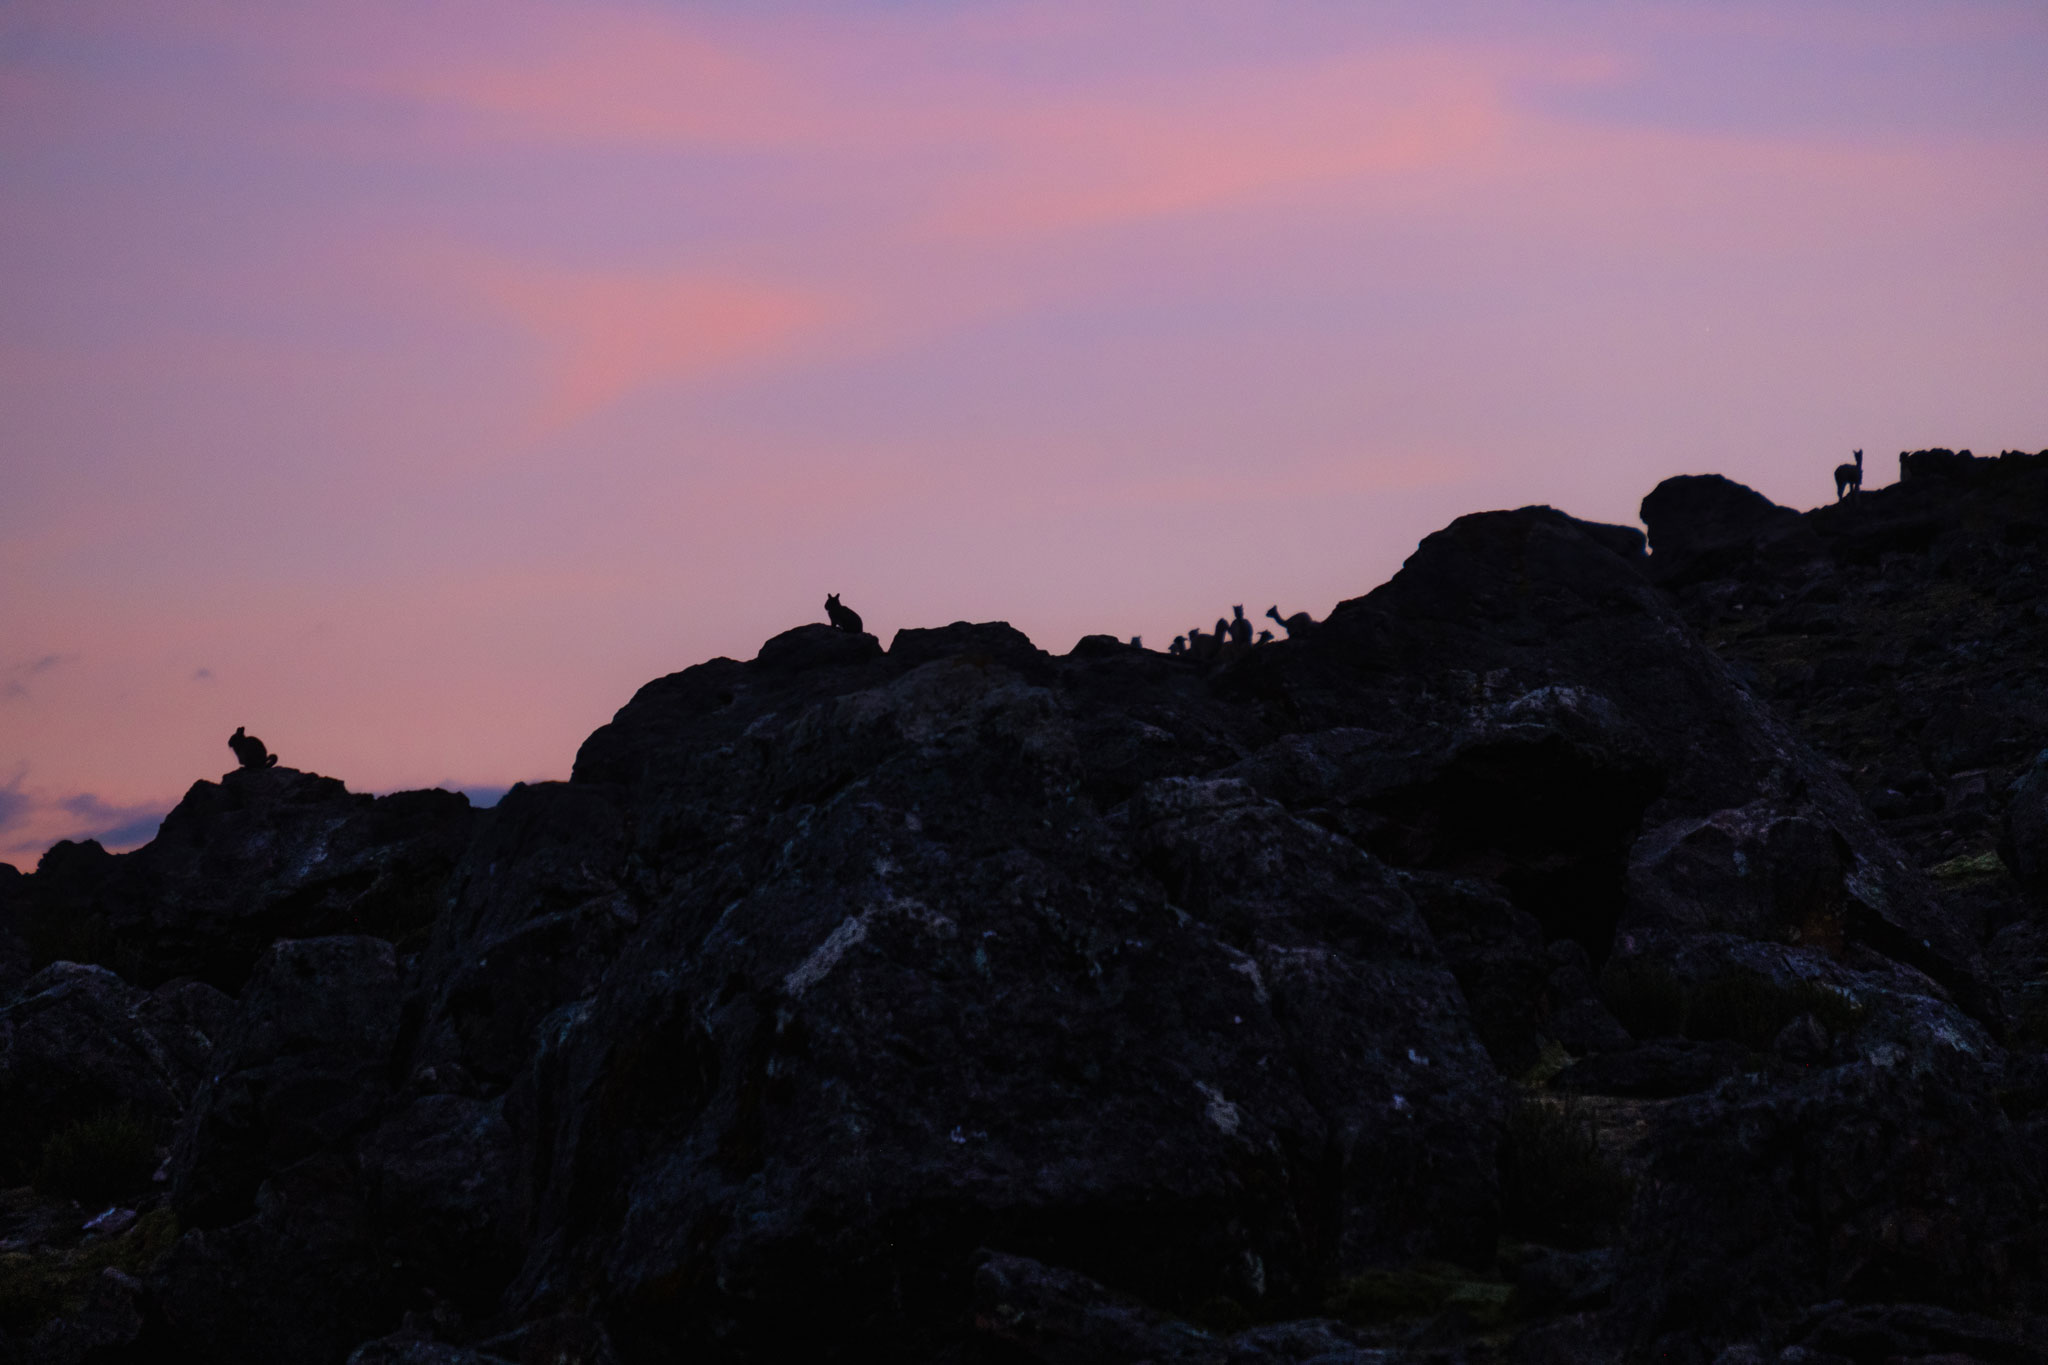 vizcacha-llama-silhouettes